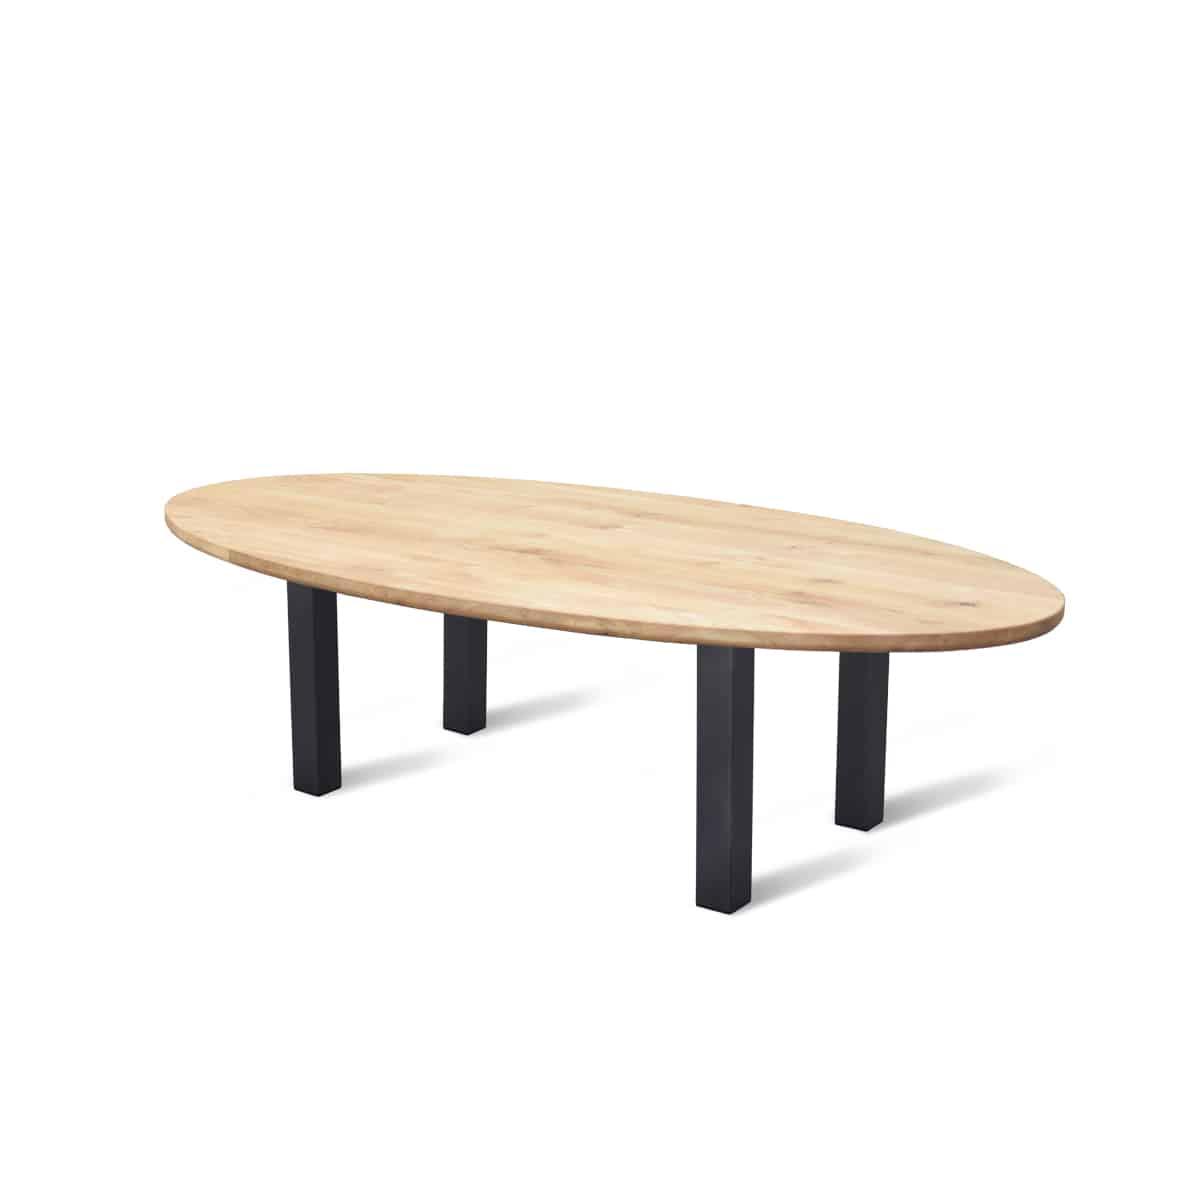 ovale eiken houten eikenhouten tafel eetkamer keuken staal stalen poten onderstel